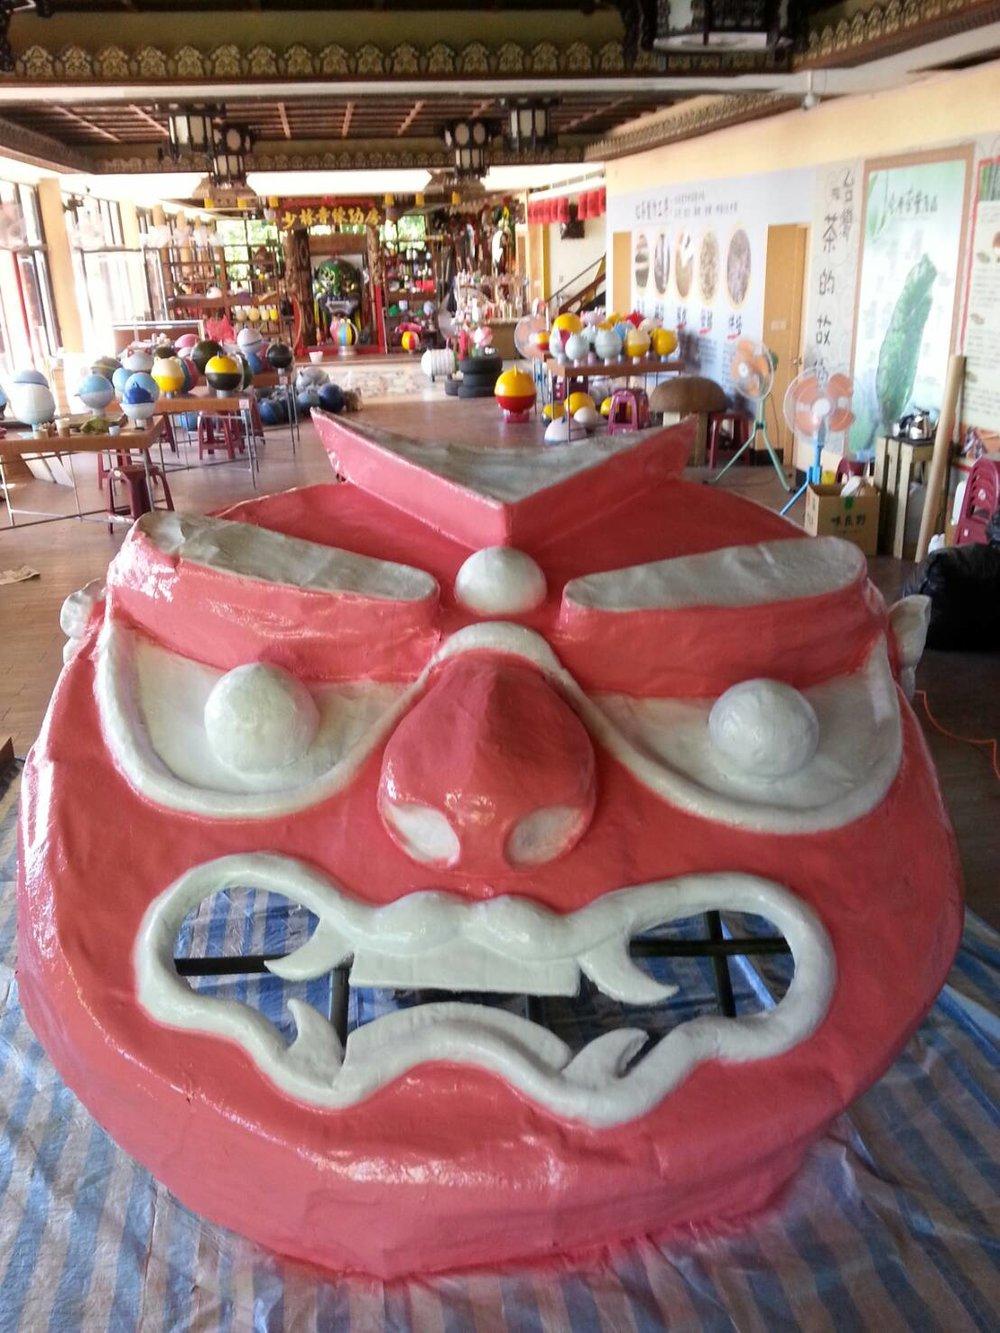 體驗傳統文化。 Traditional Culture Sculpturing Workshop